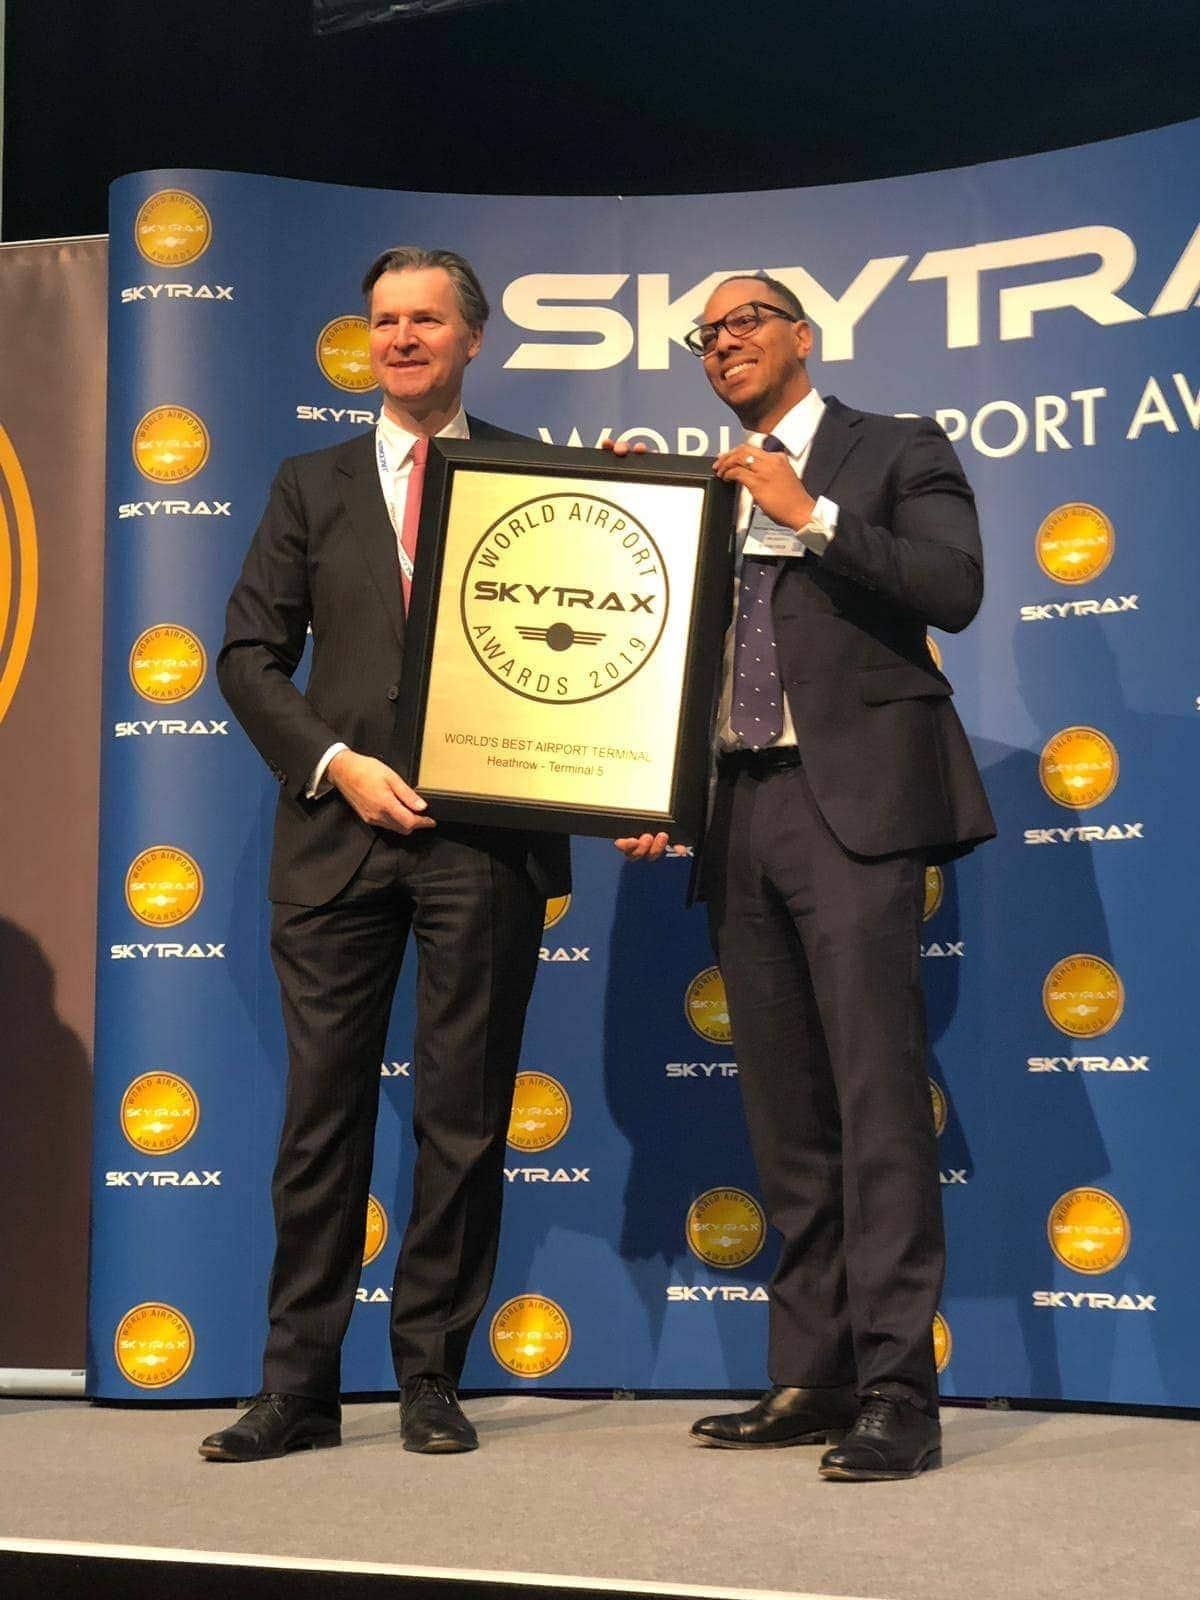 man receives skytrax award